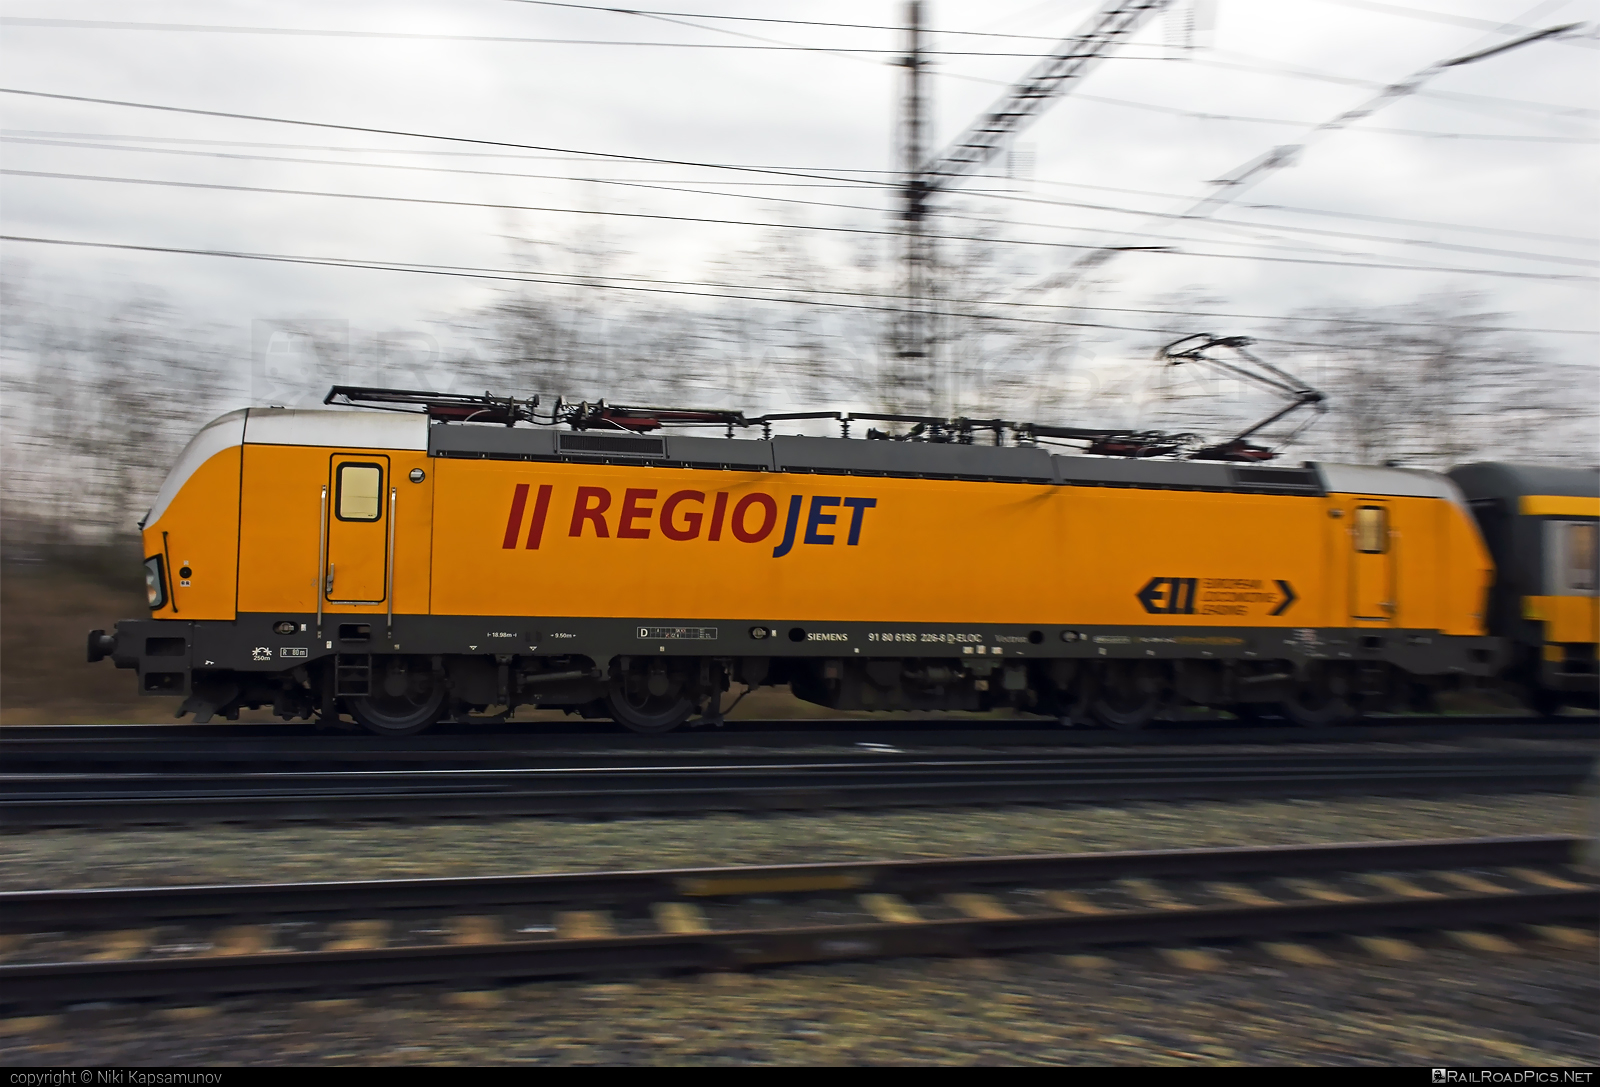 Siemens Vectron MS - 193 226 operated by RegioJet, a.s. #ell #ellgermany #eloc #europeanlocomotiveleasing #regiojet #siemens #siemensvectron #siemensvectronms #vectron #vectronms